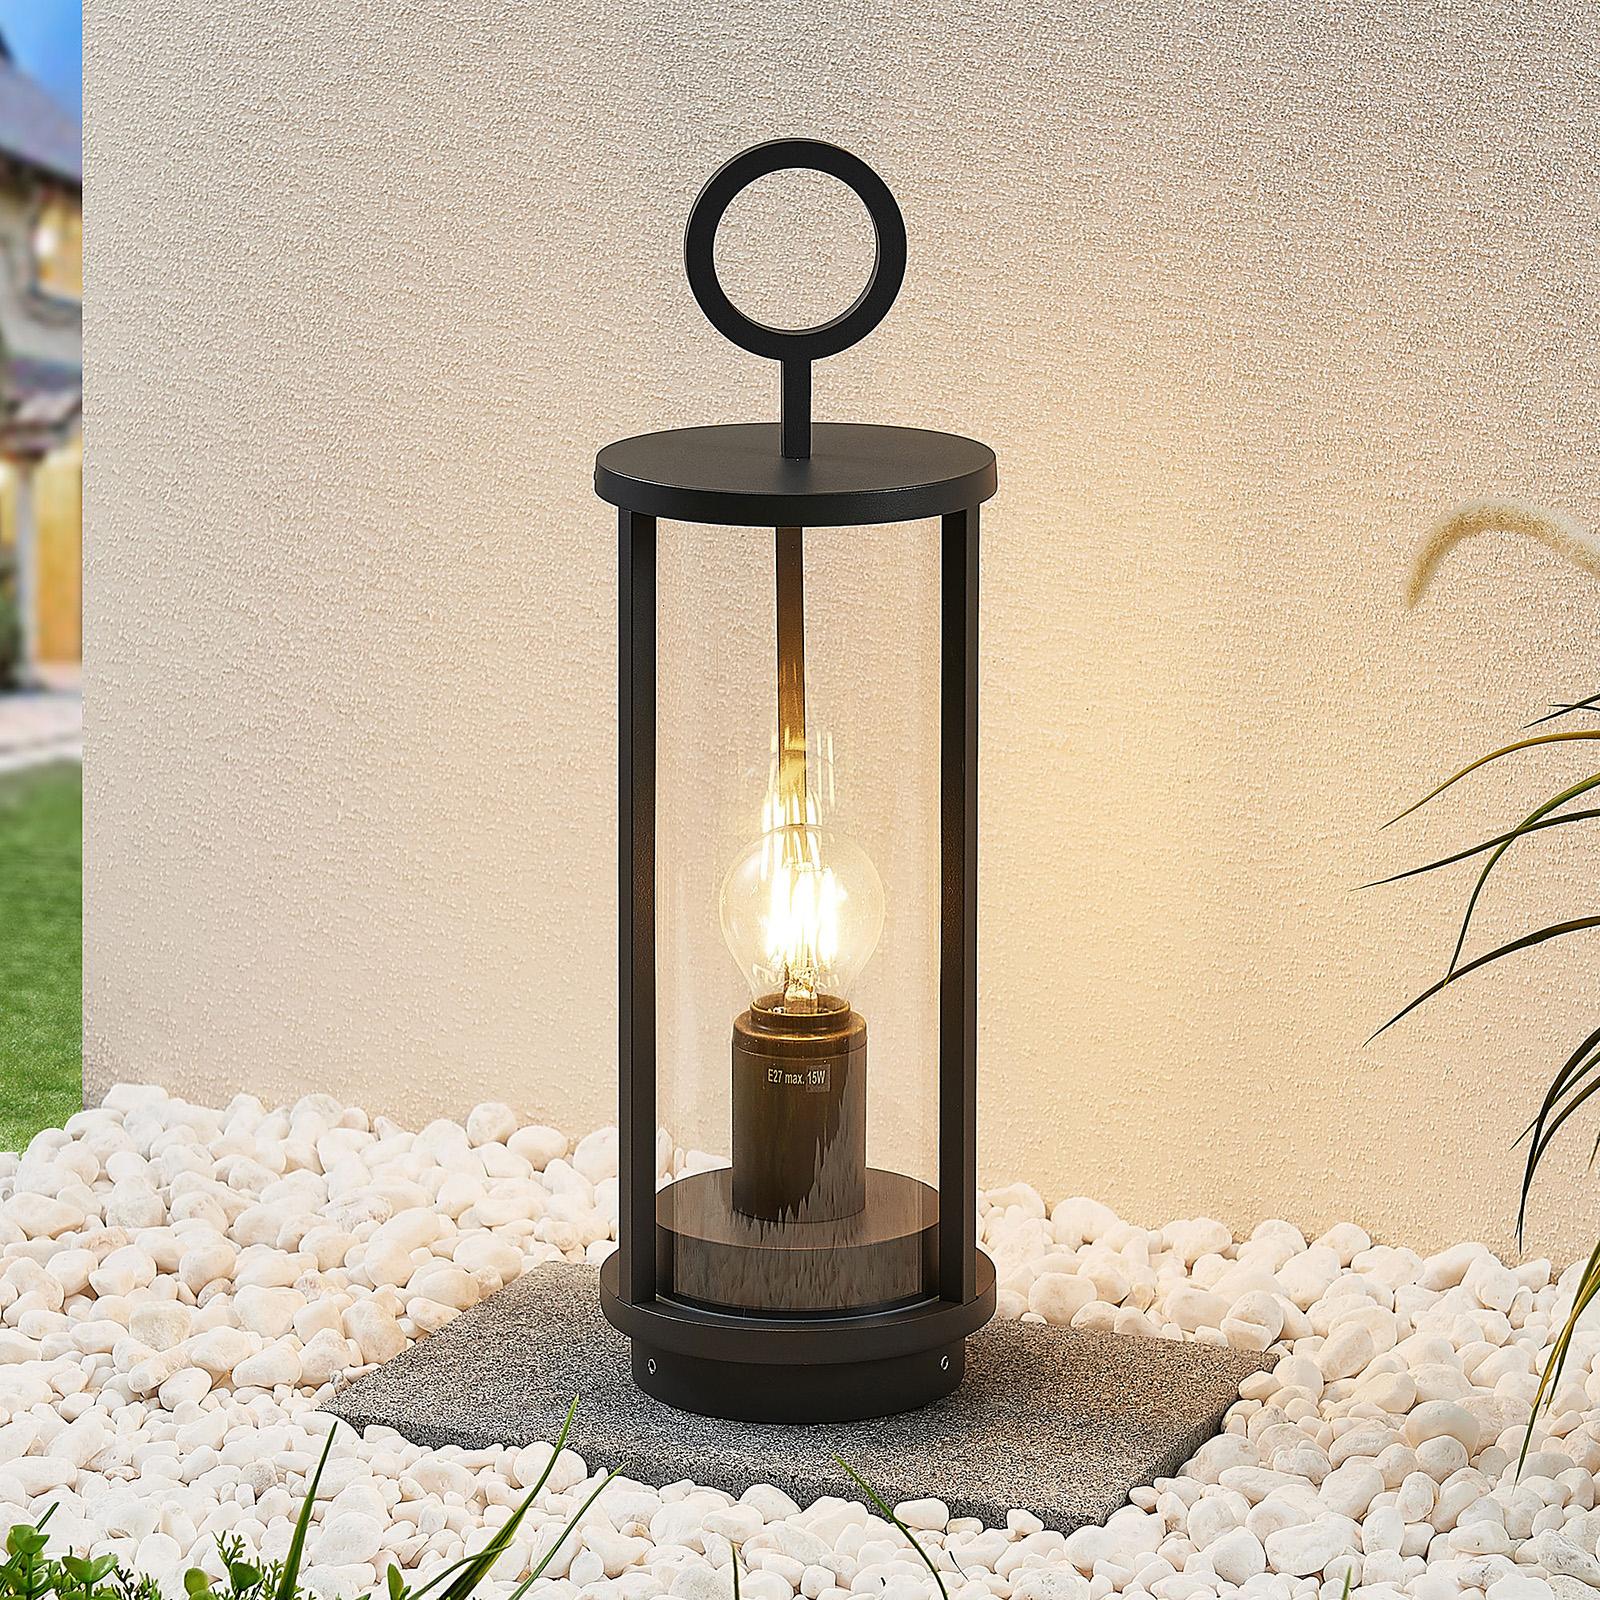 Lucande Emmeline słupek oświetleniowy, 34 cm